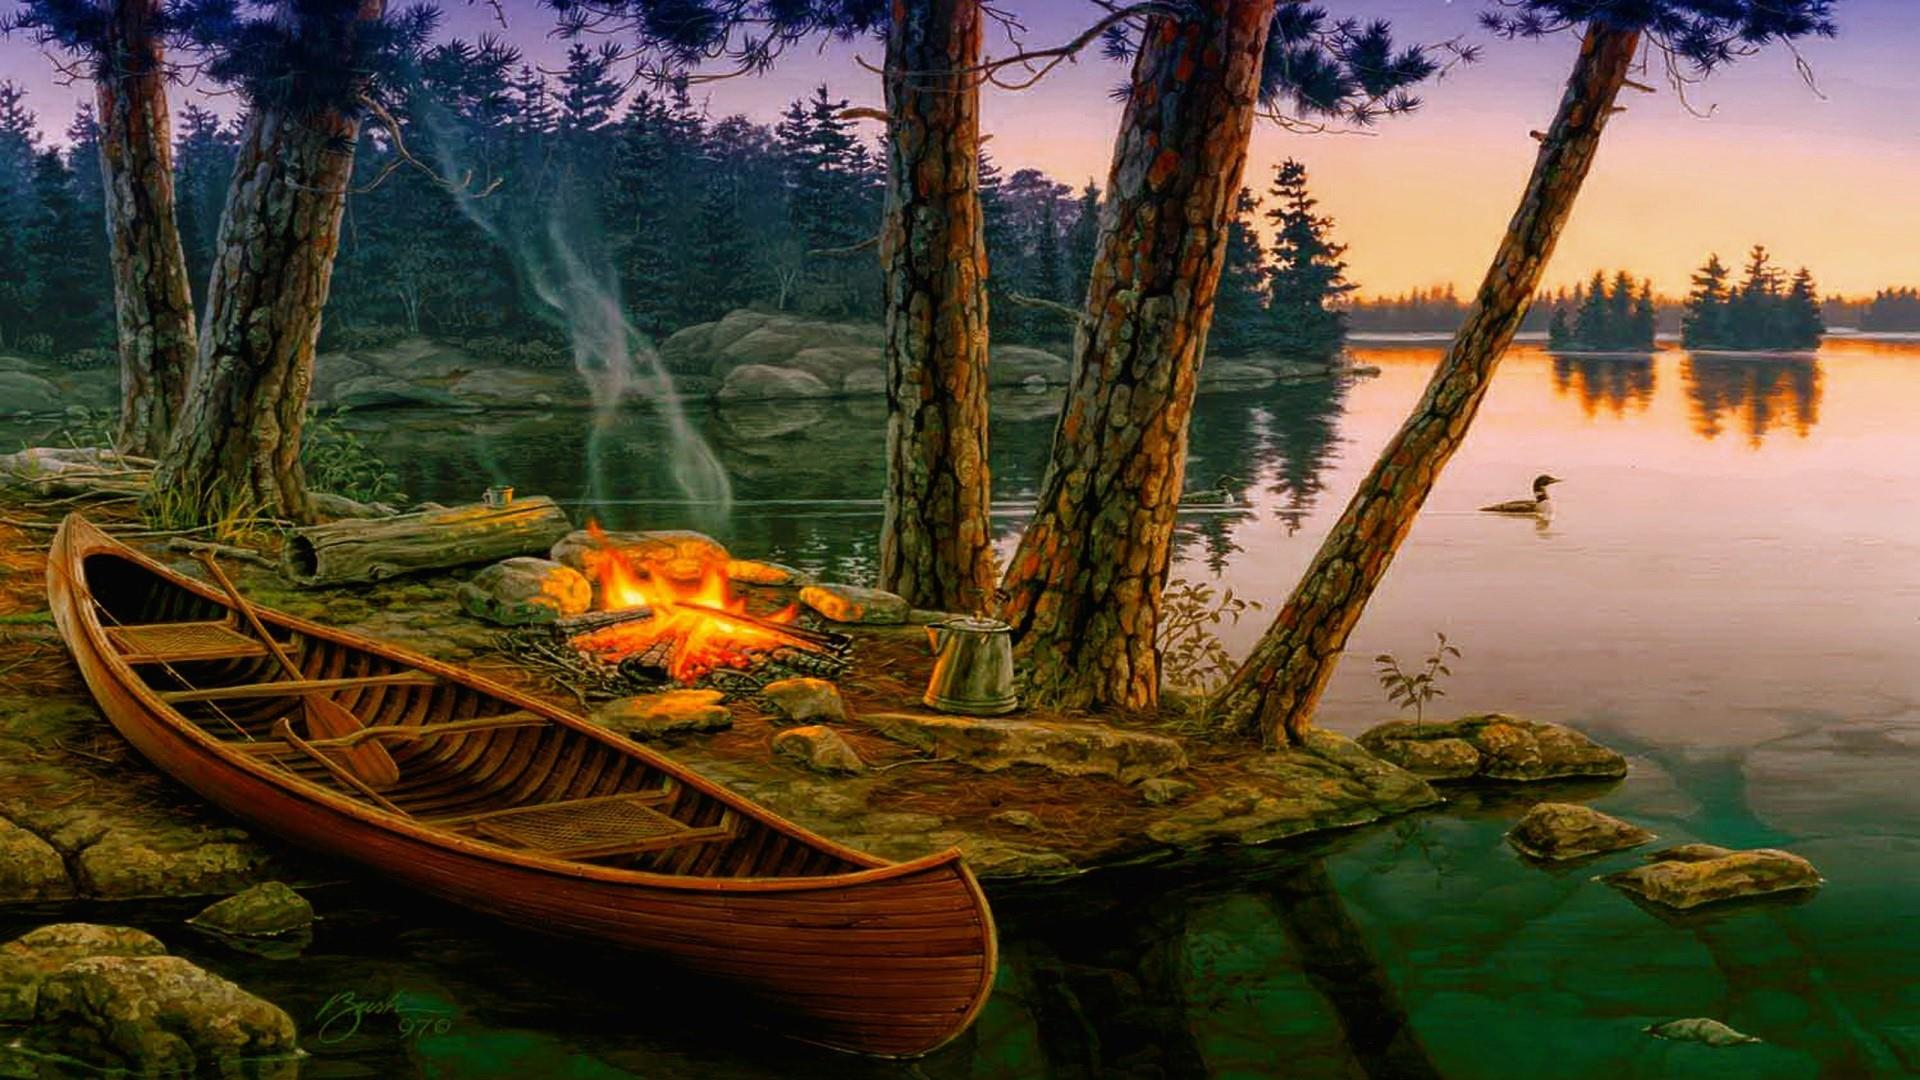 Campfire at the lakeside wallpaper